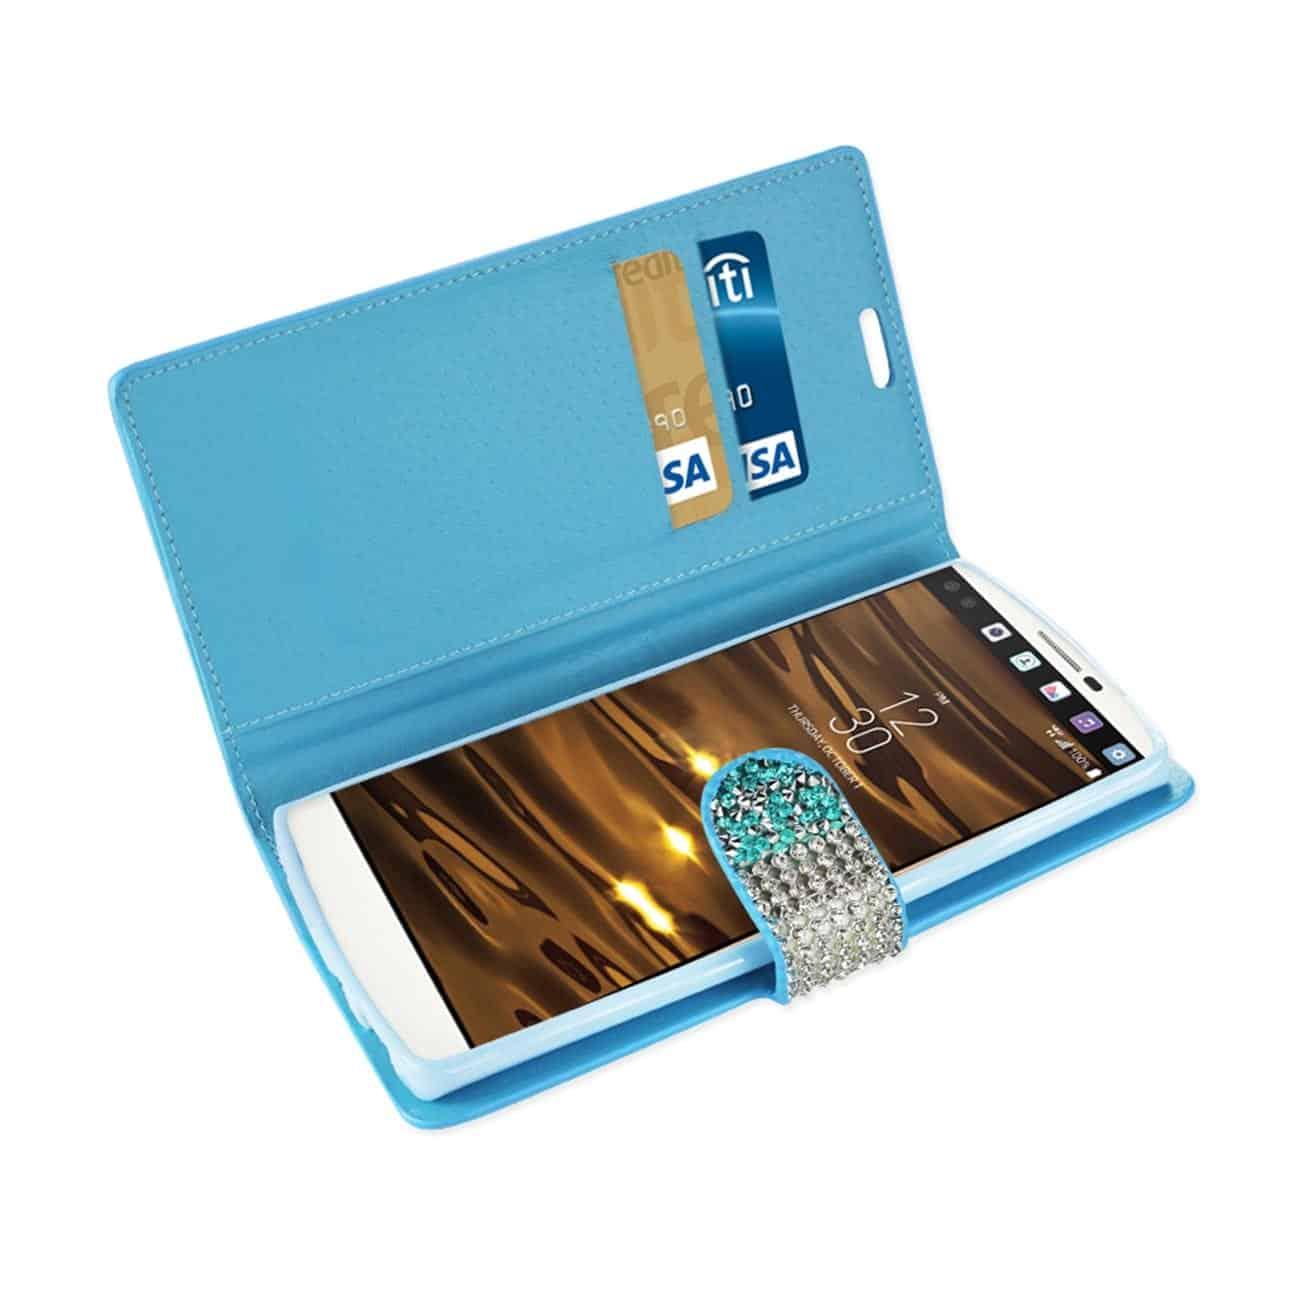 LG V10 JEWELRY RHINESTONE WALLET CASE IN BLUE